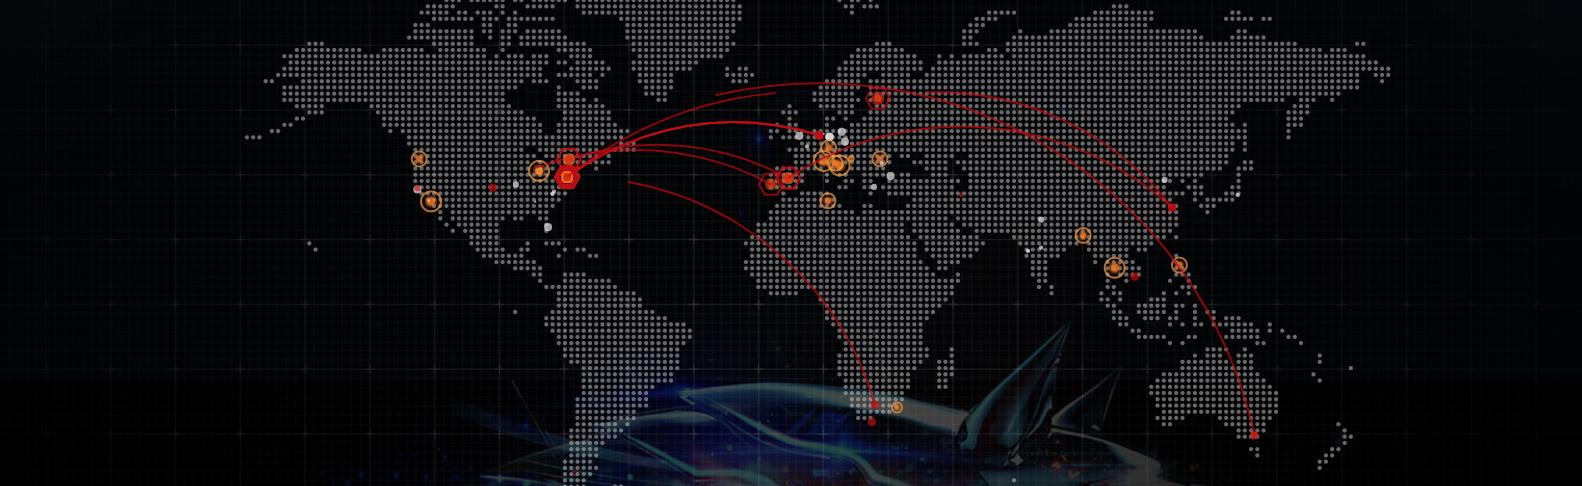 threatmap-mini.png